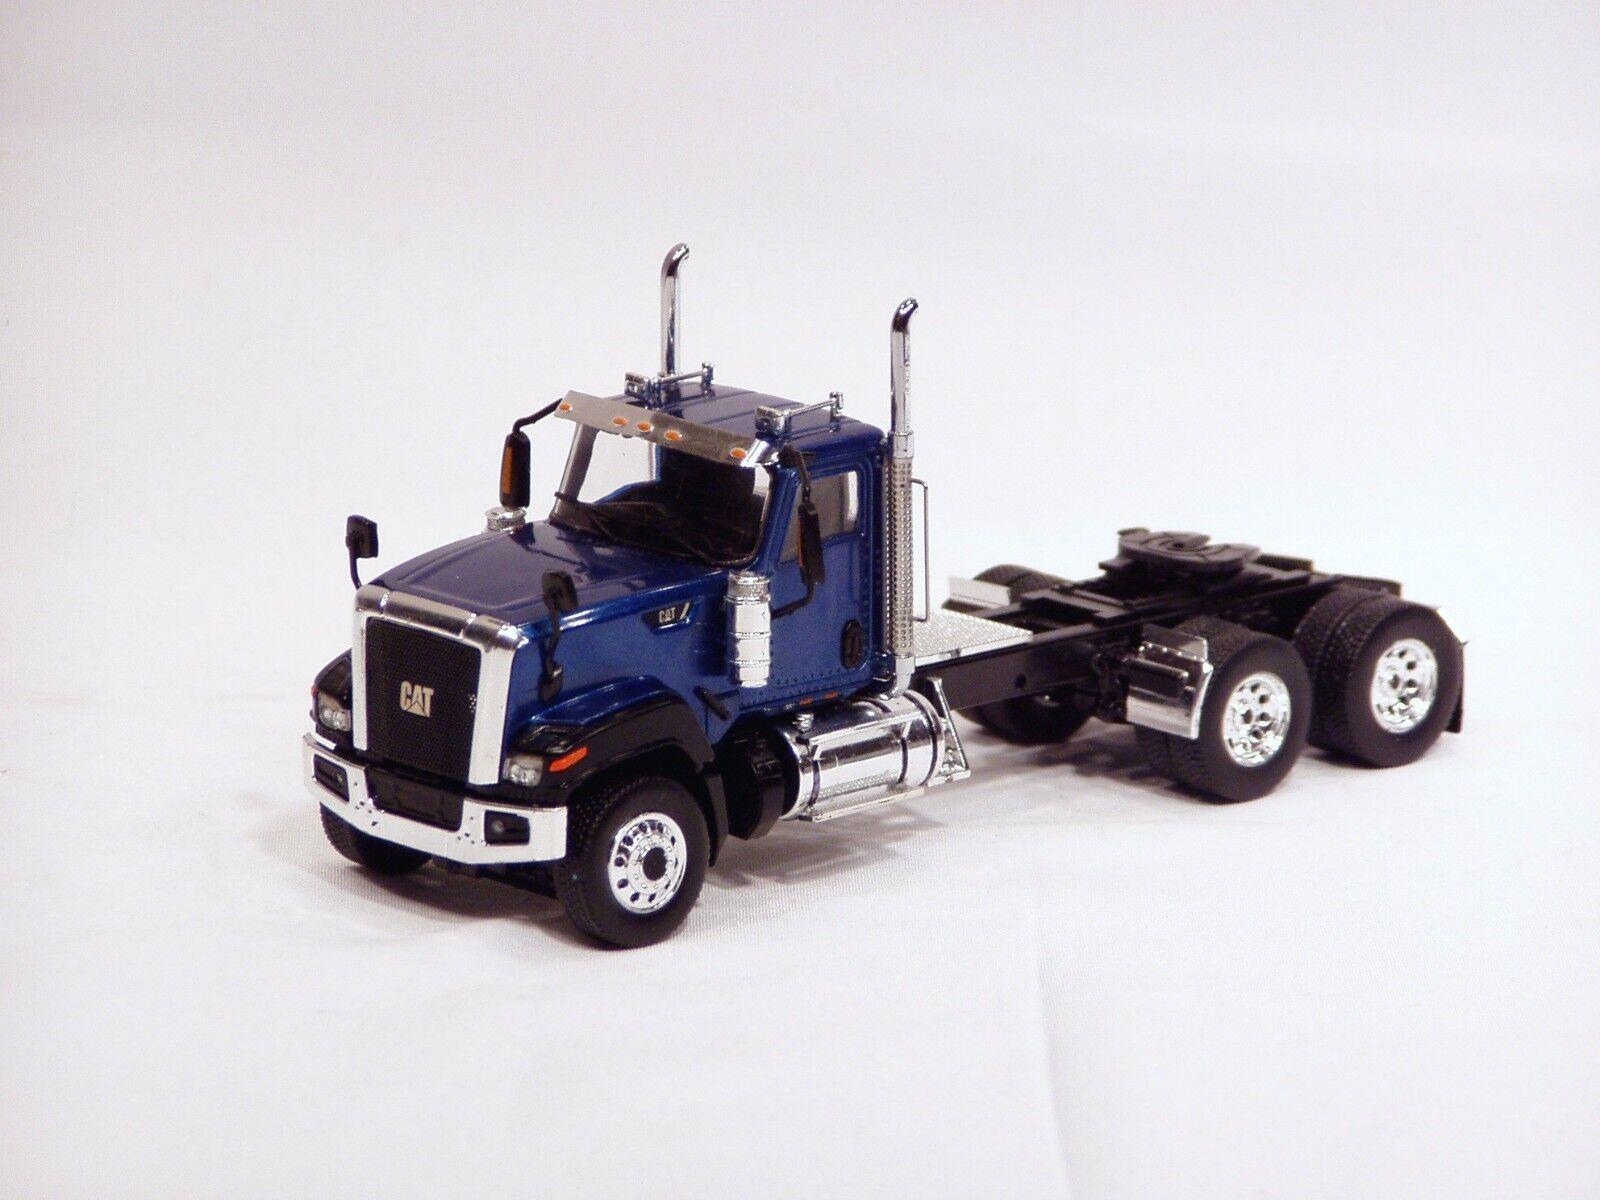 Caterpillar CT680 6x4 Camion Trattore  blu  150  WSI